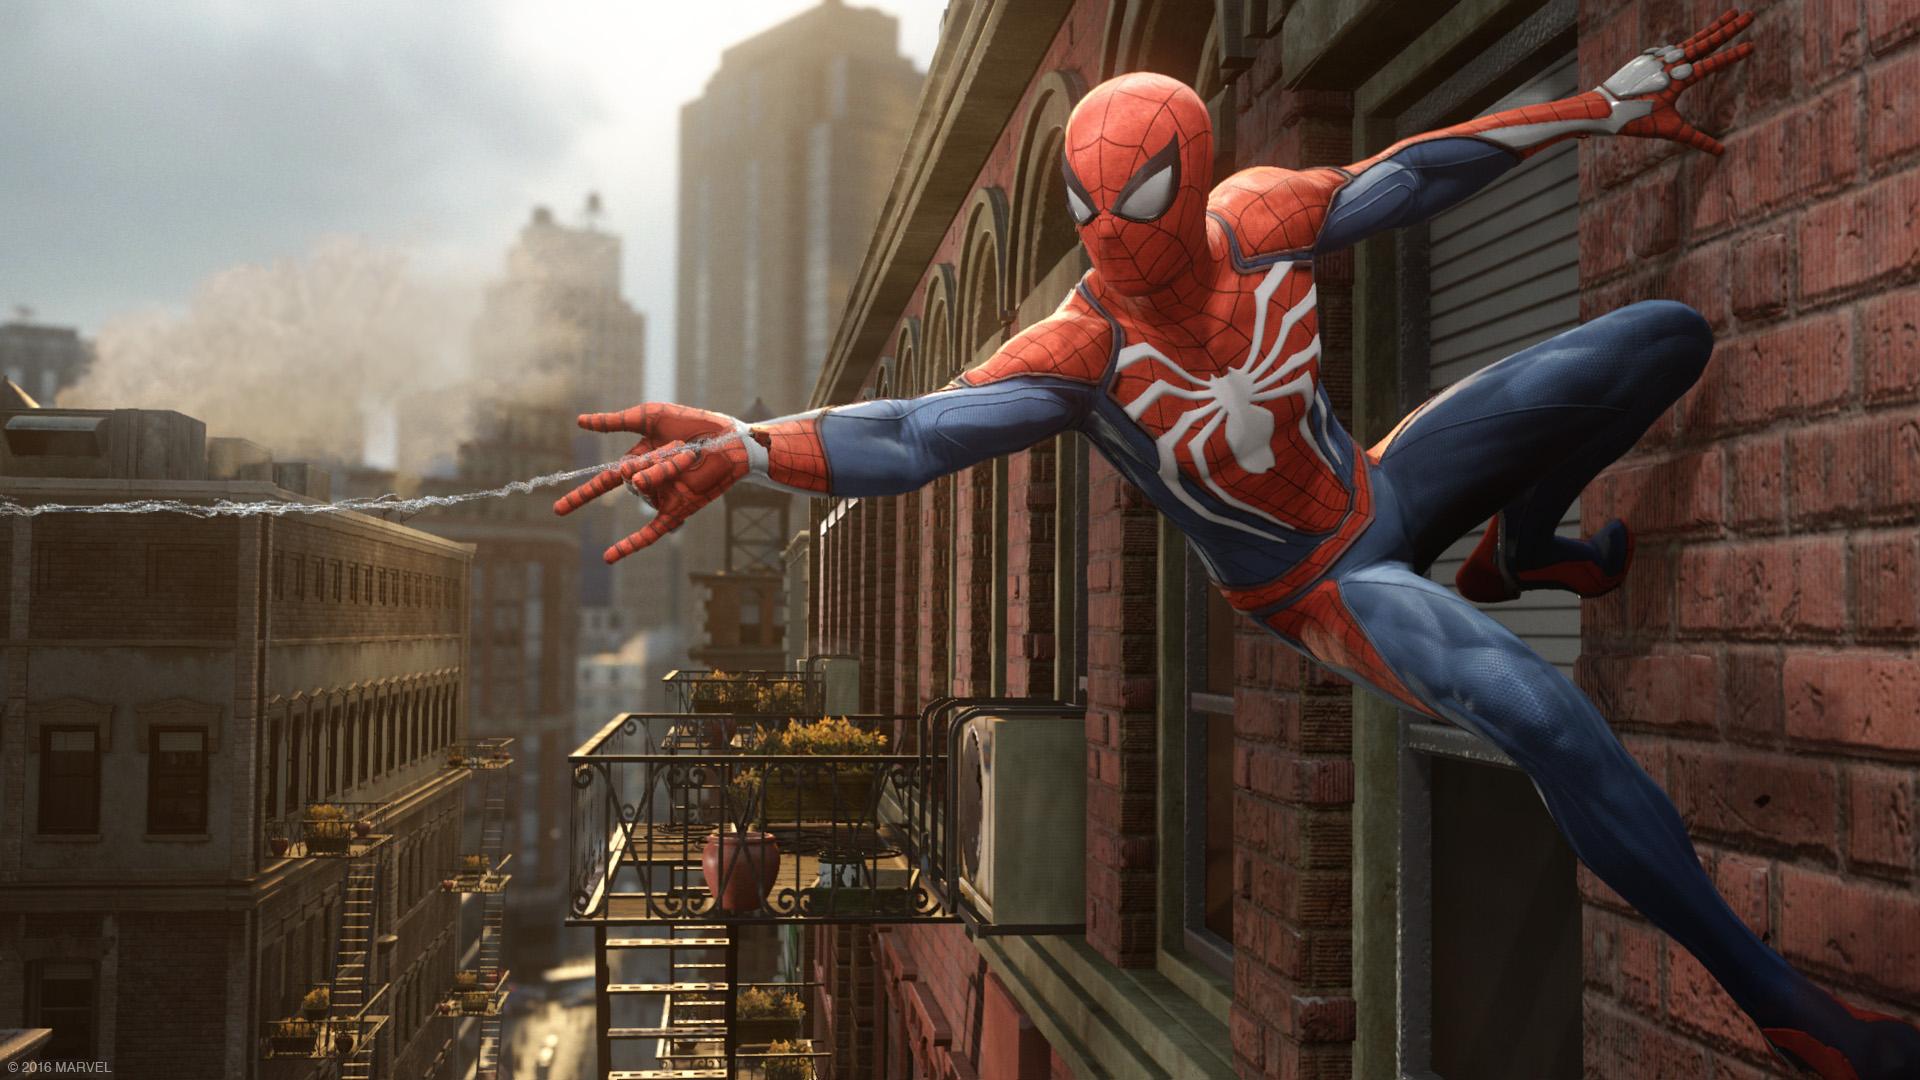 Spiderman screen ps4 002 1465878337 1490045363